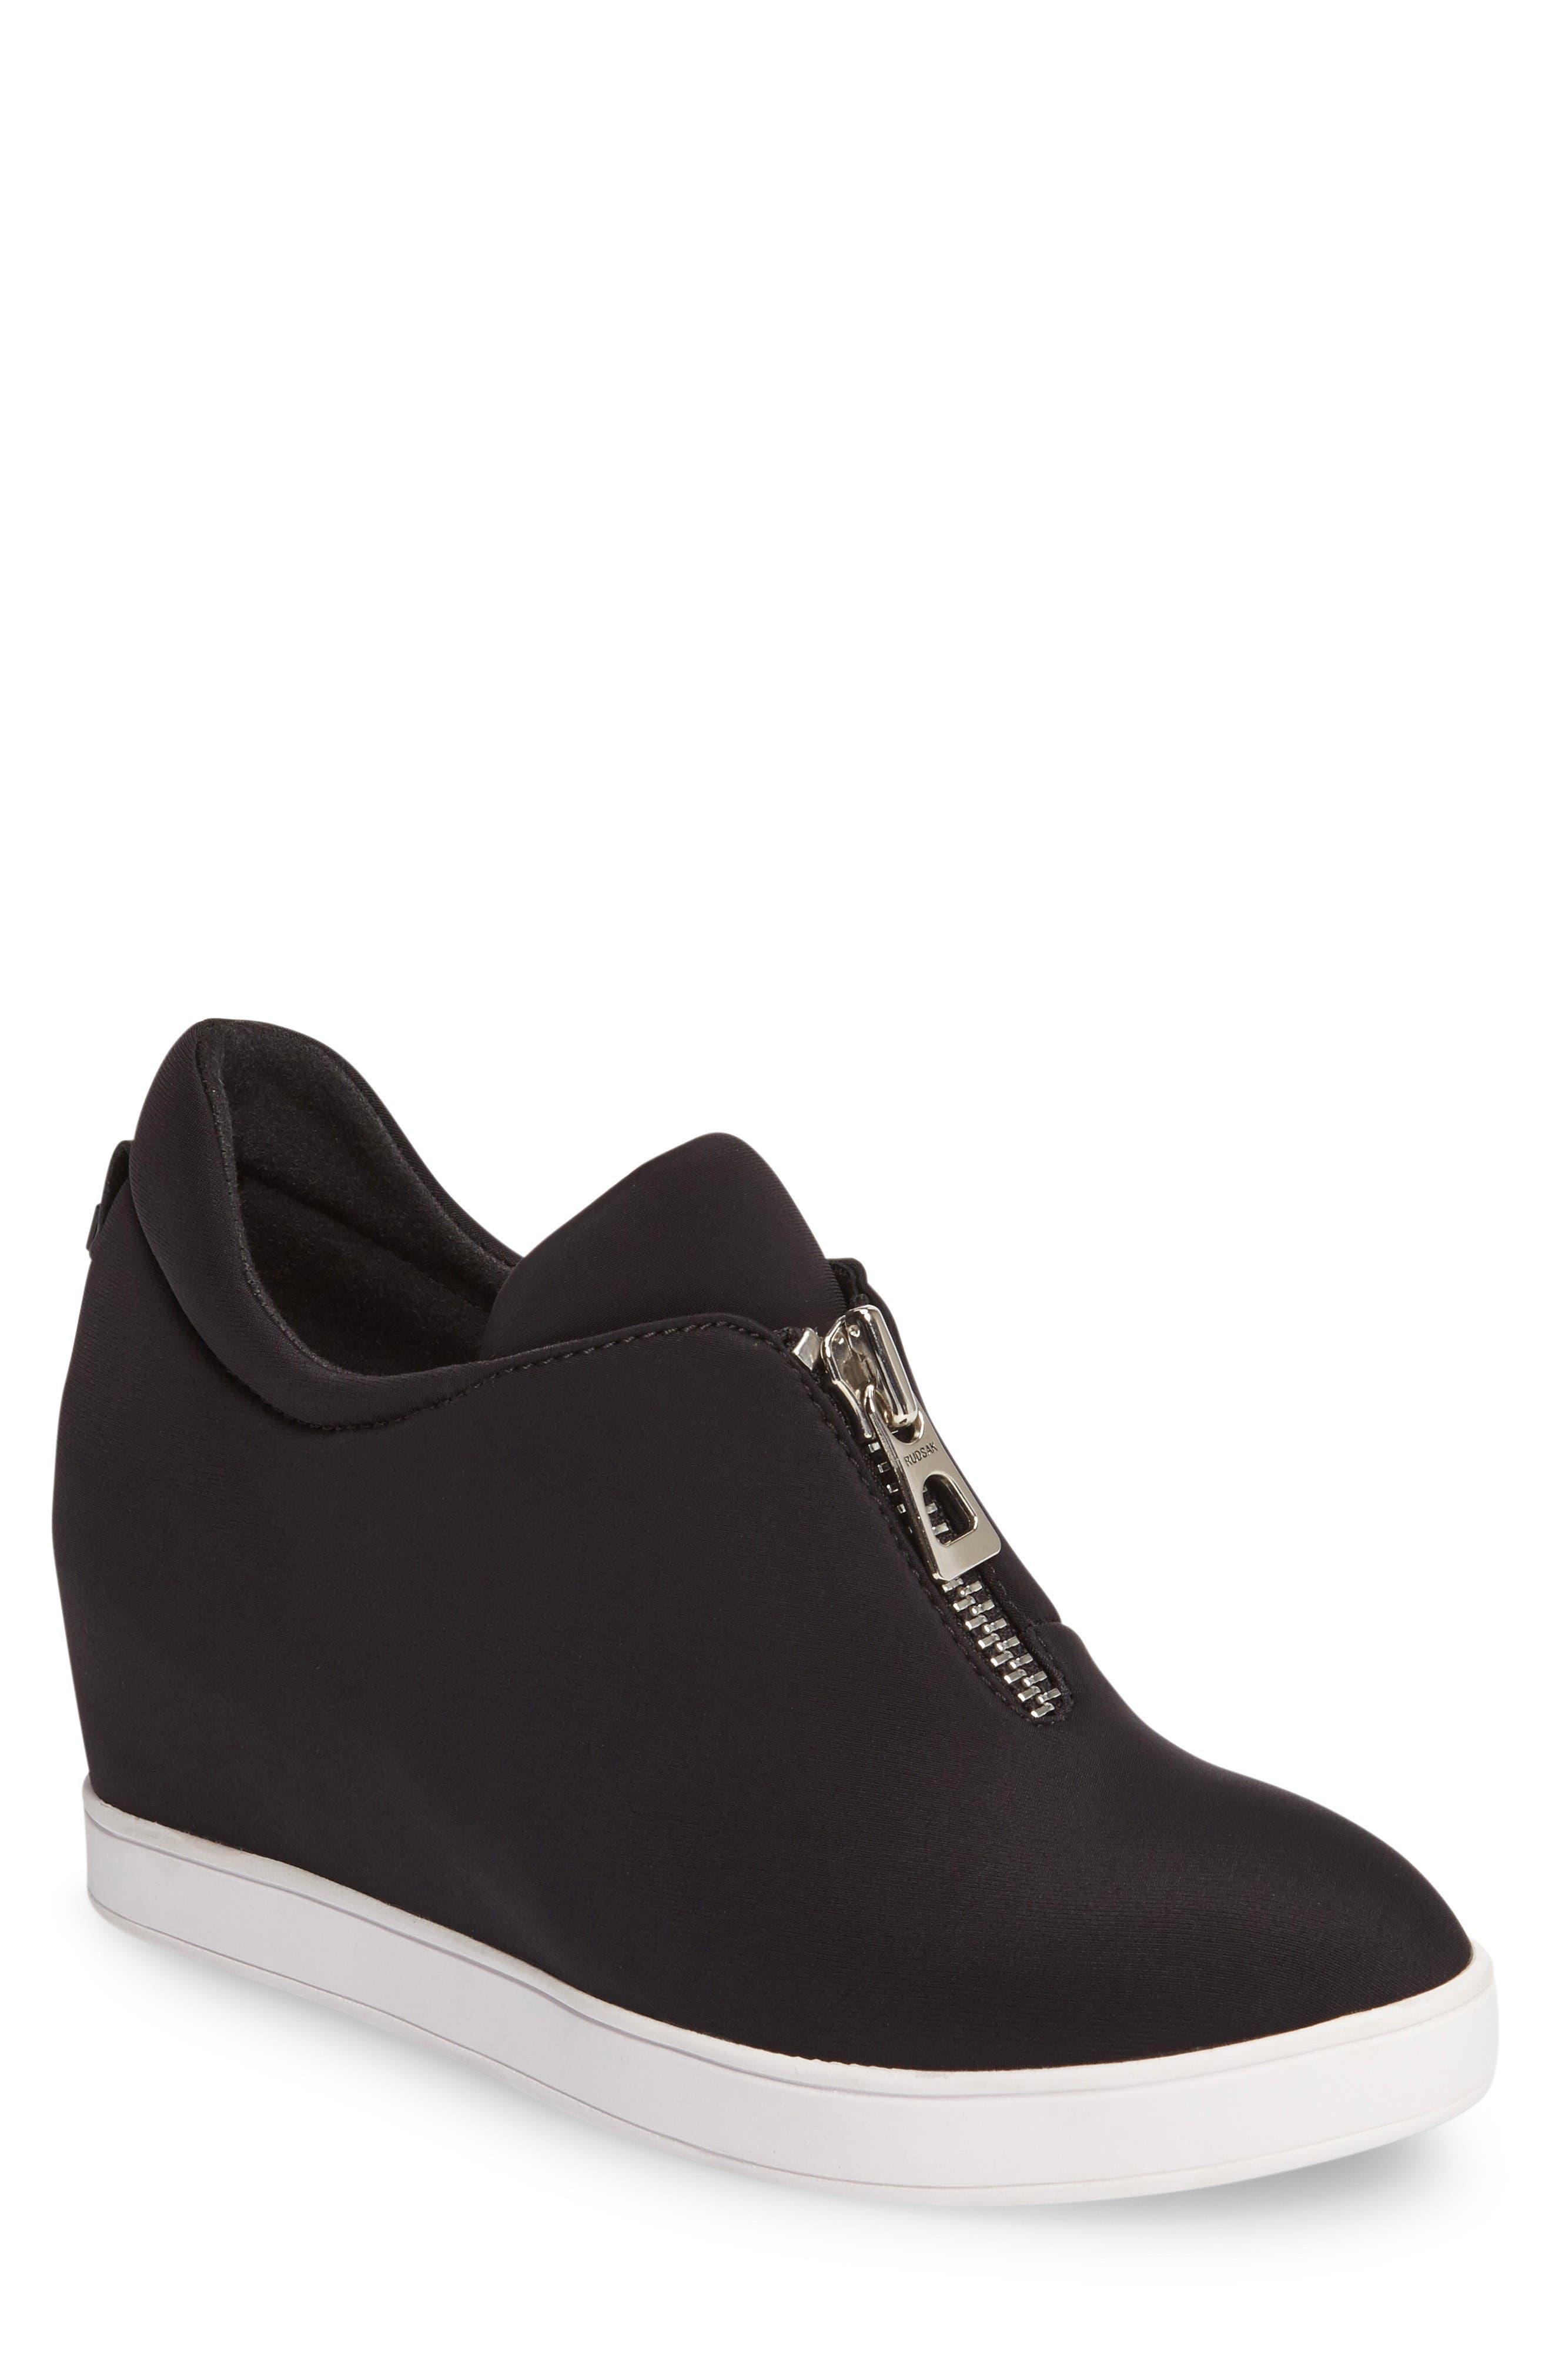 Rudsak Rebbia Wedge Sneaker (Women)